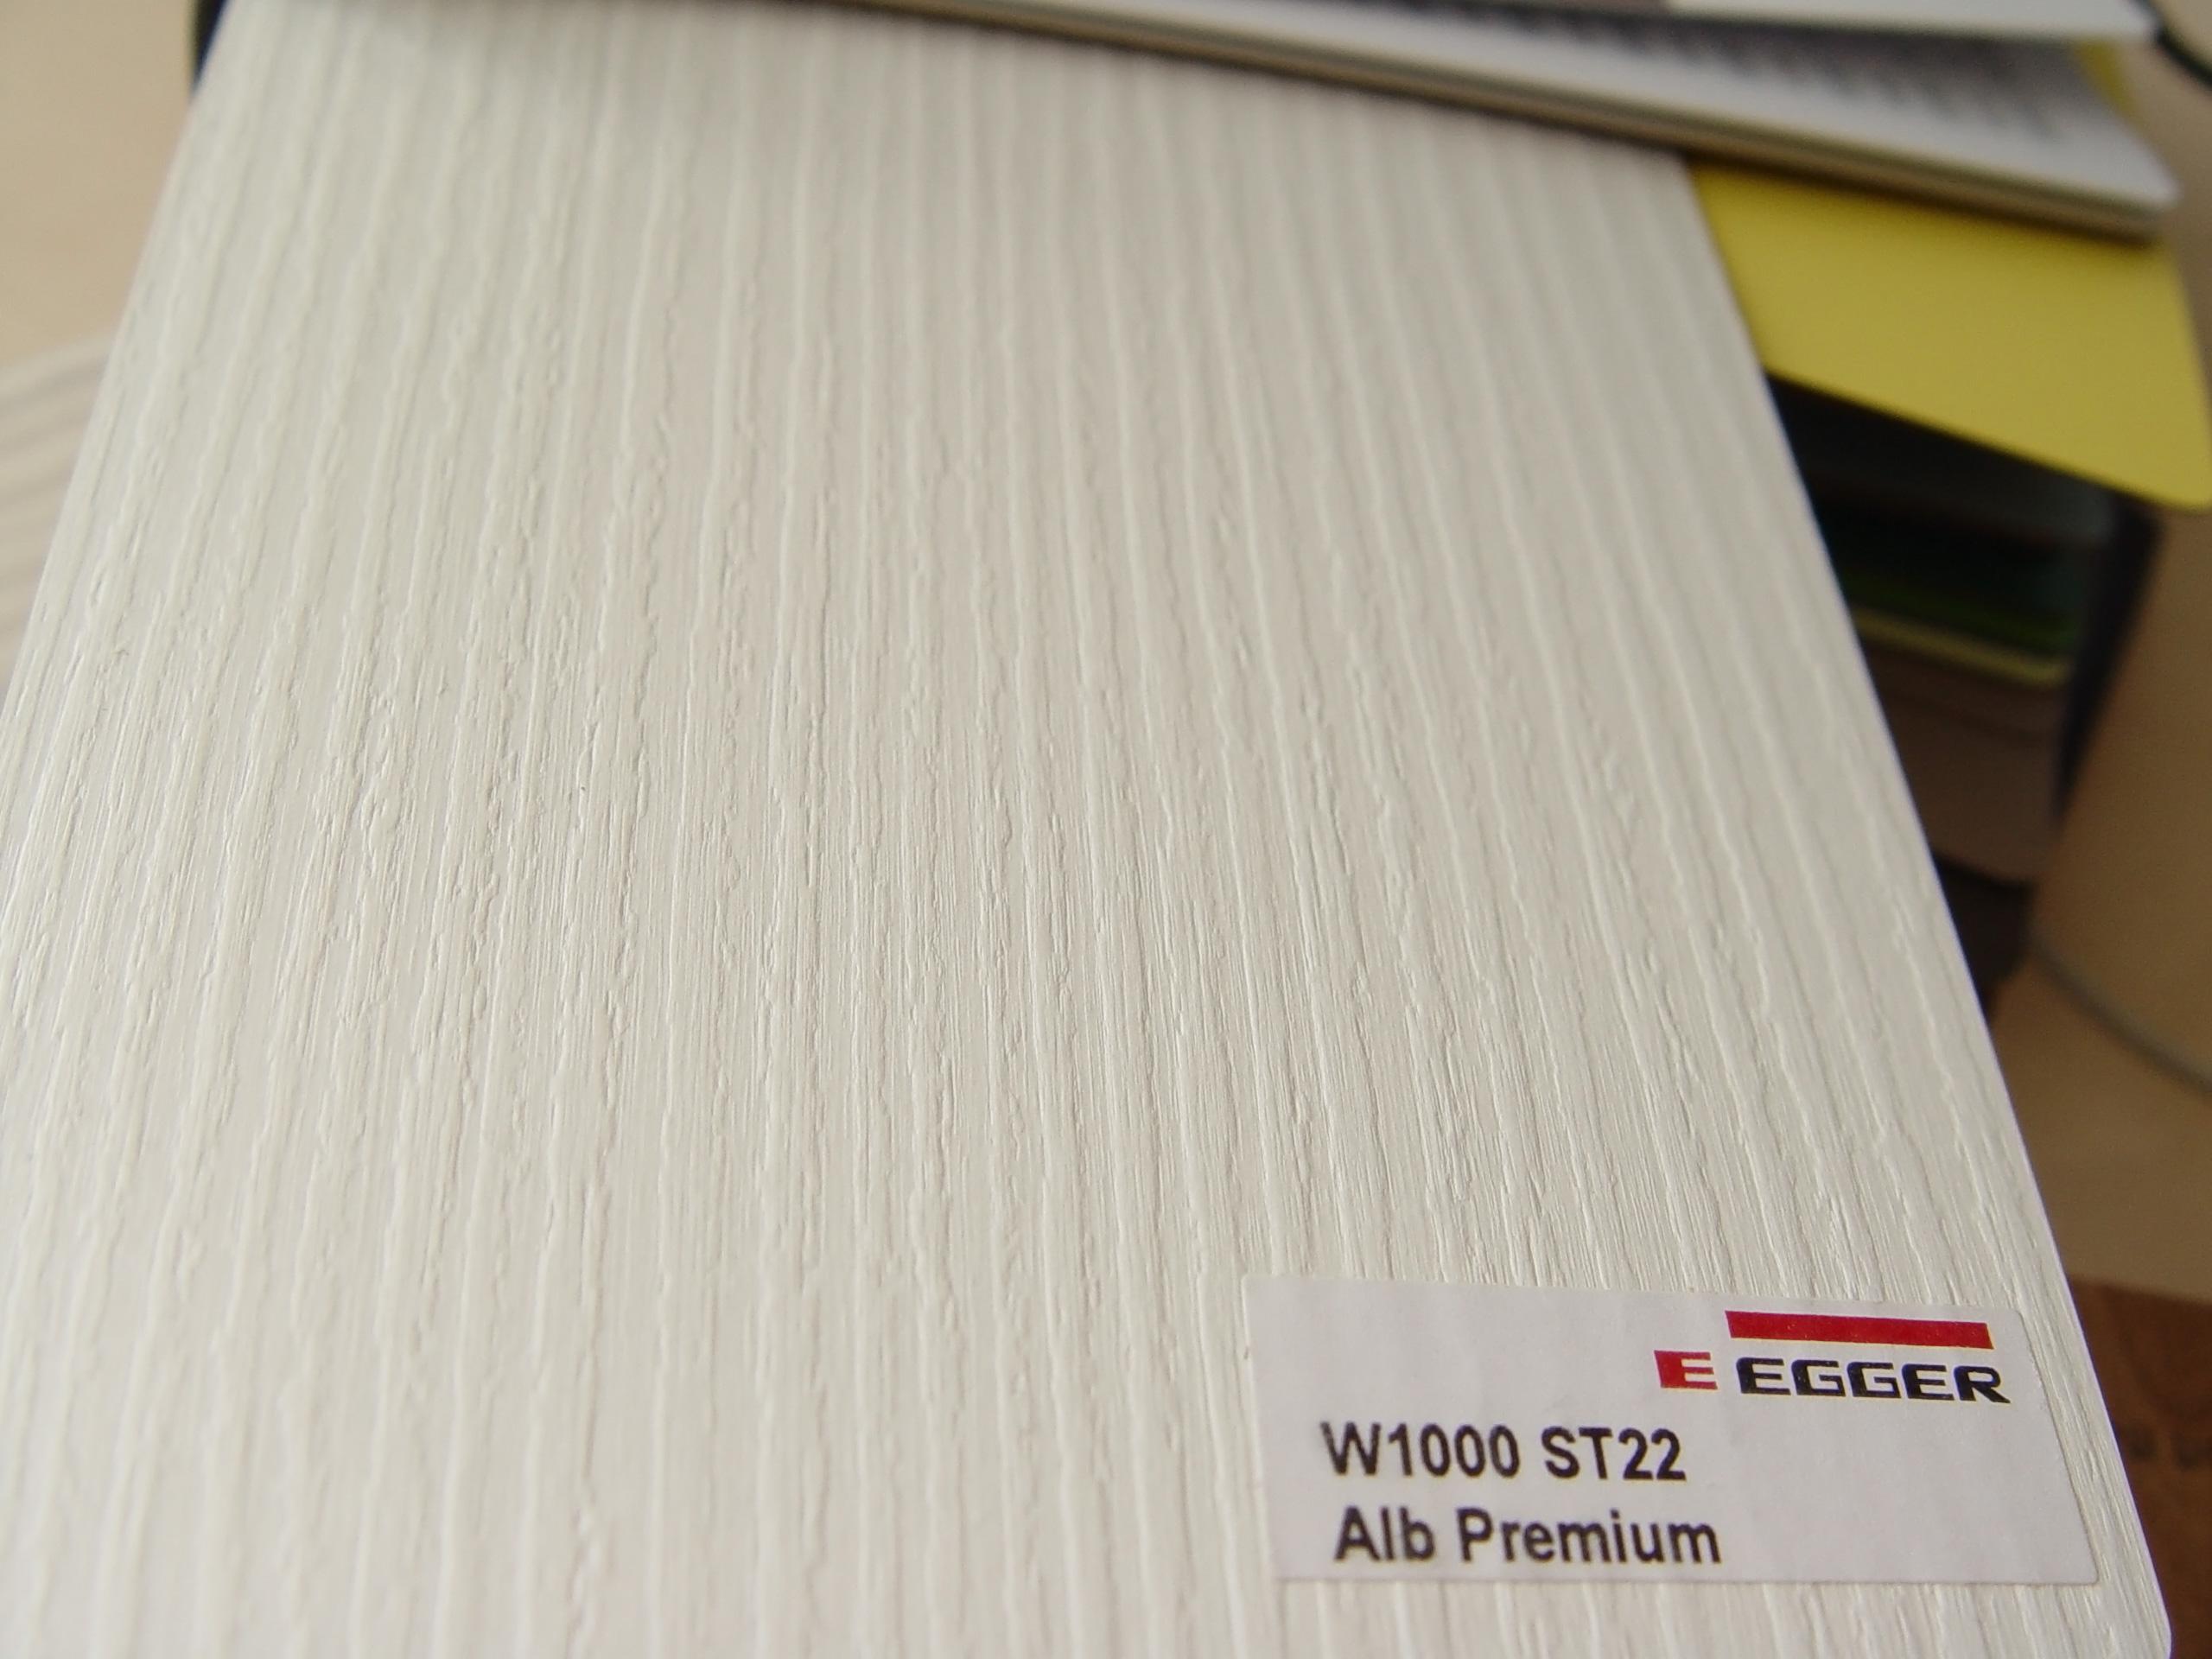 paletar egger alb premium